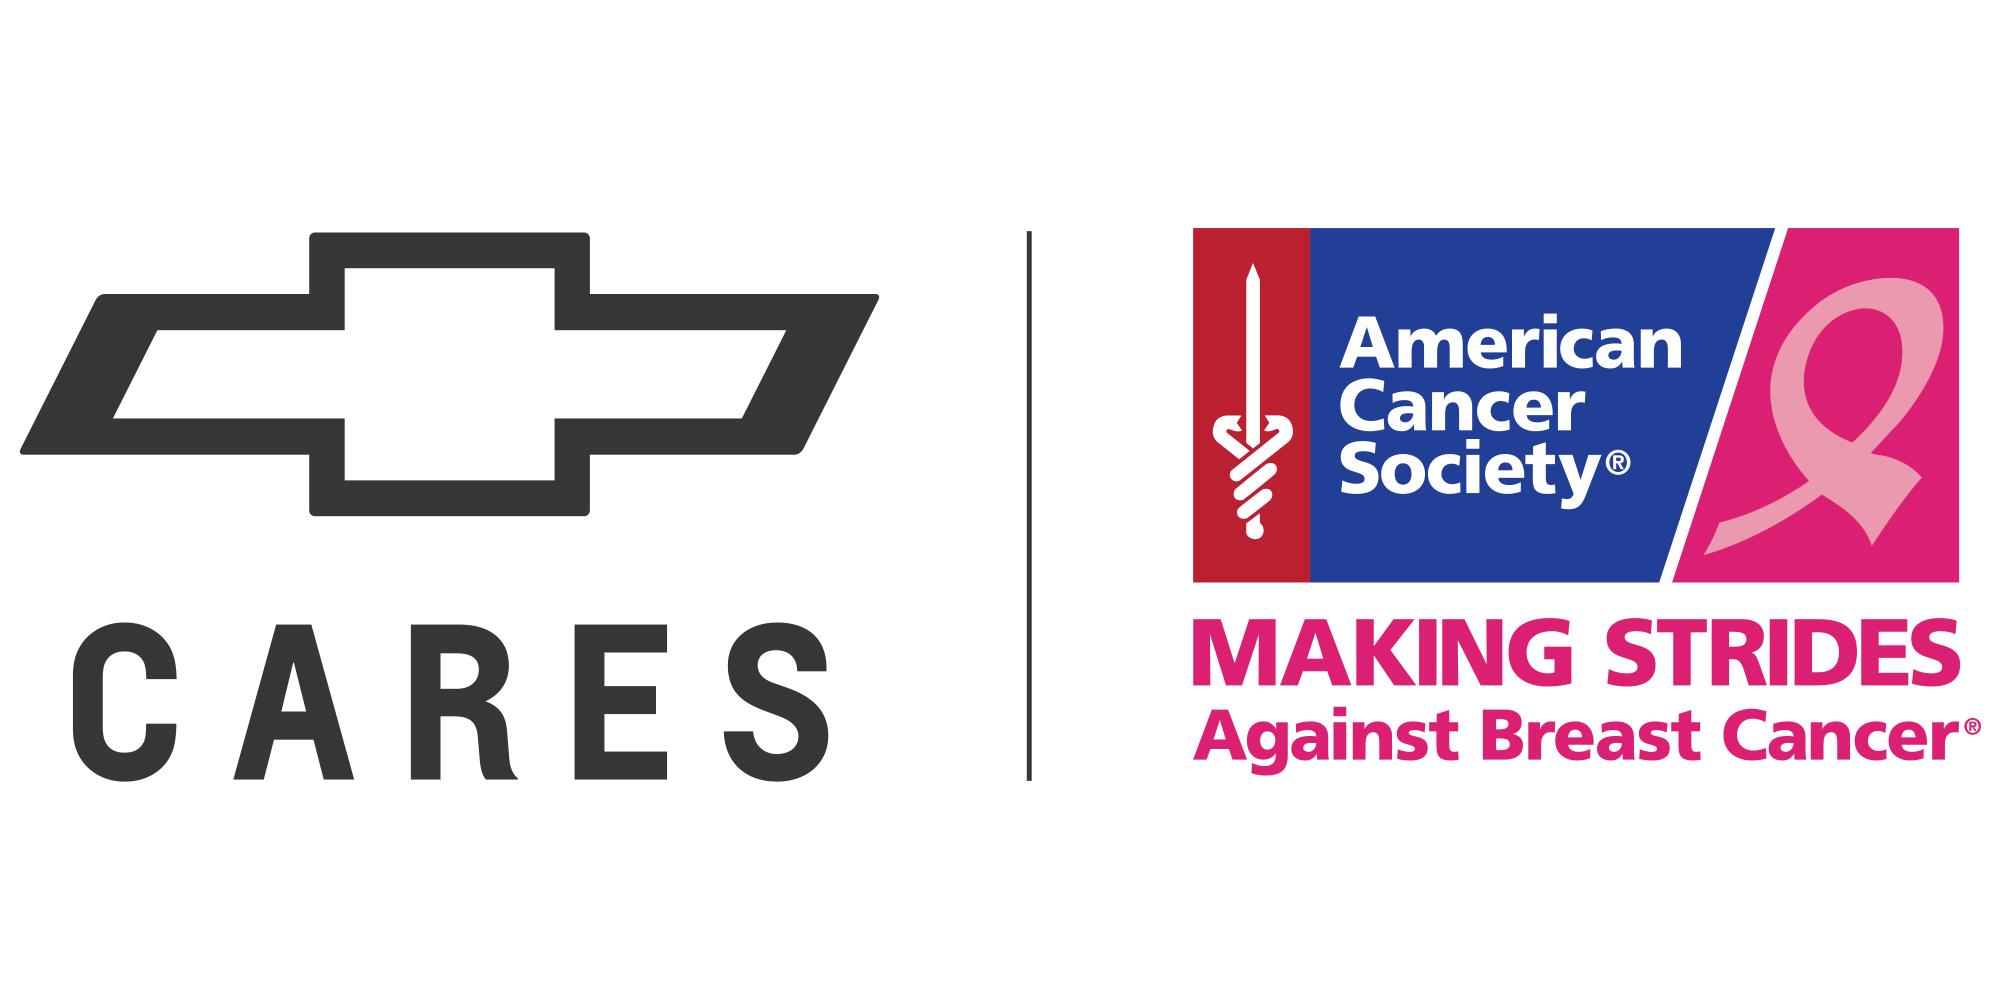 Chevy Cares - American Cancer Society Logo Lockup